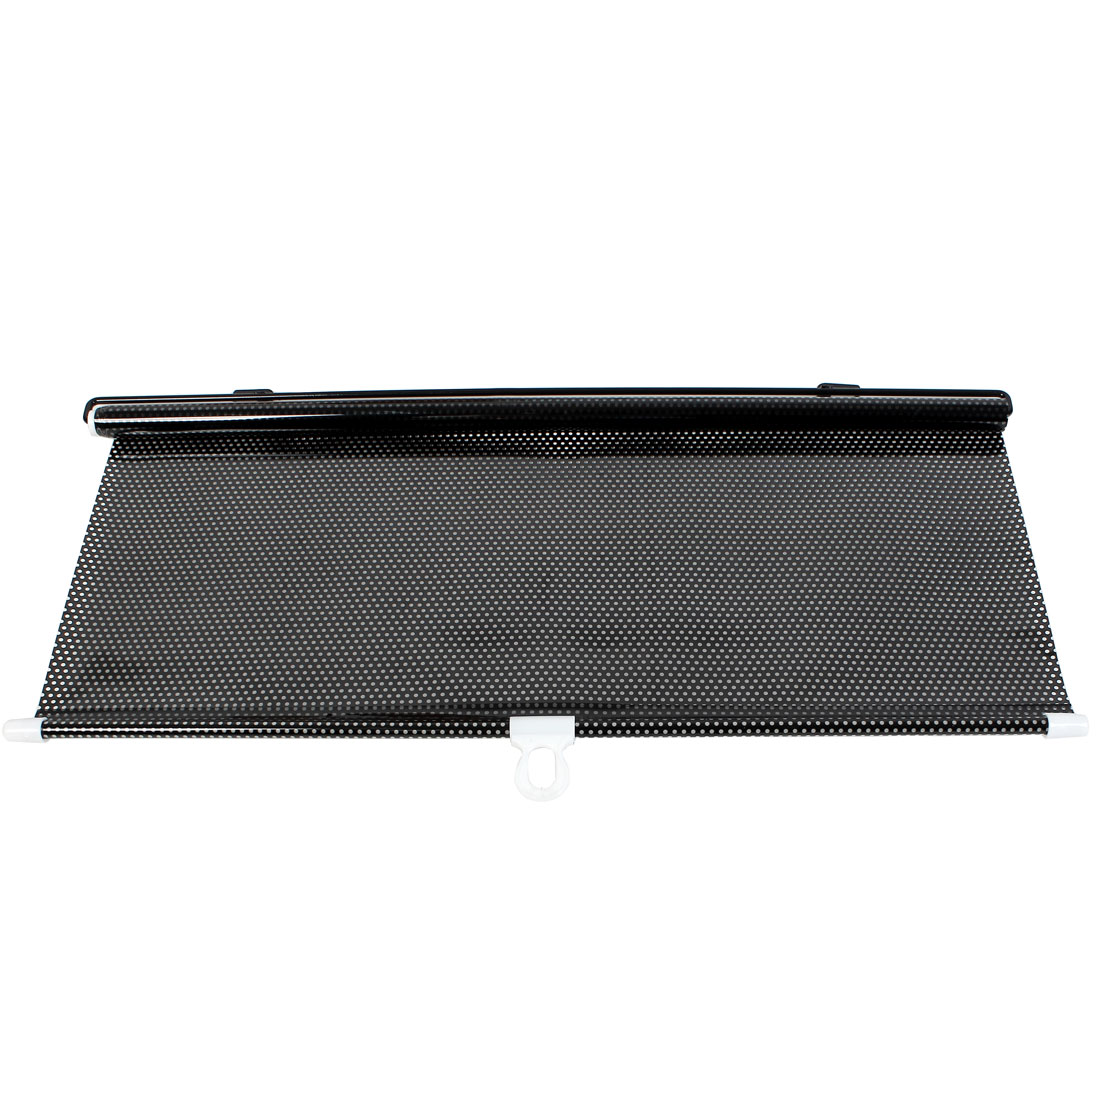 Car Auto Sun Shade Window Screen Cover Retractable Sunshade Protector 125cm x 50cm